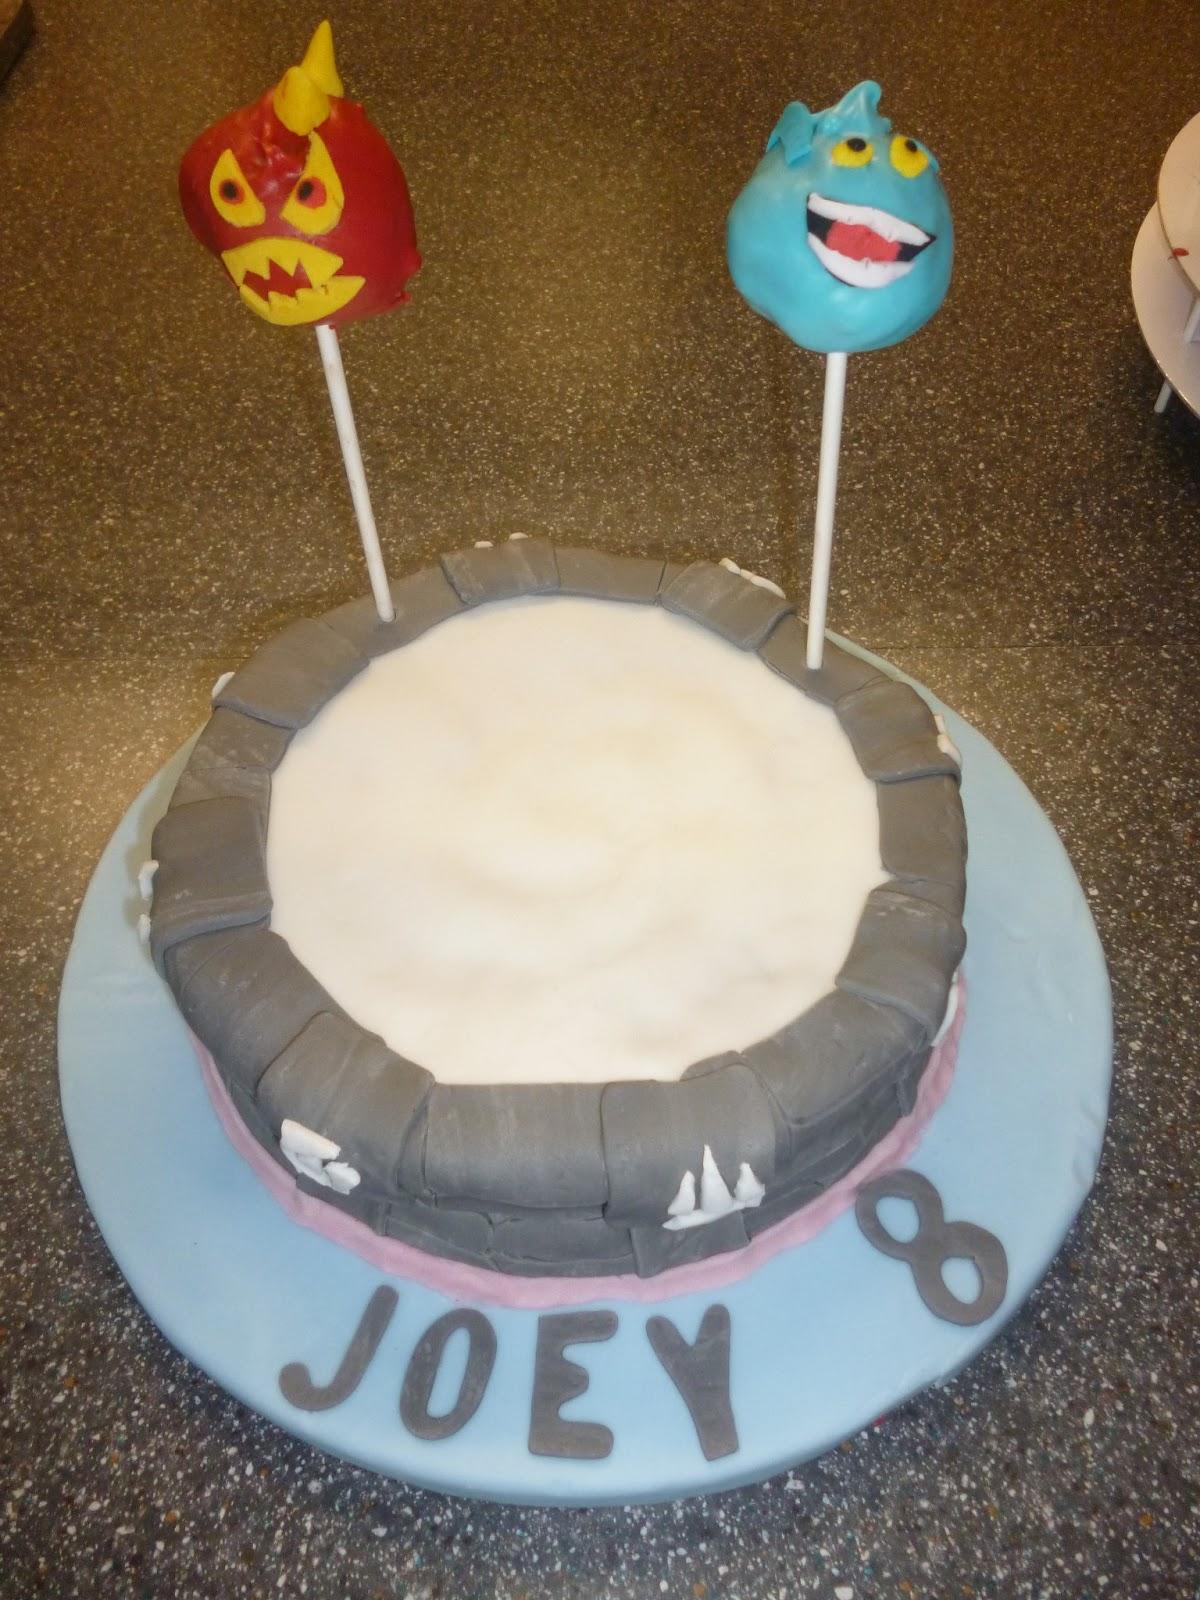 Anniething For Food Skylanders Portal Of Power Birthday Cake And